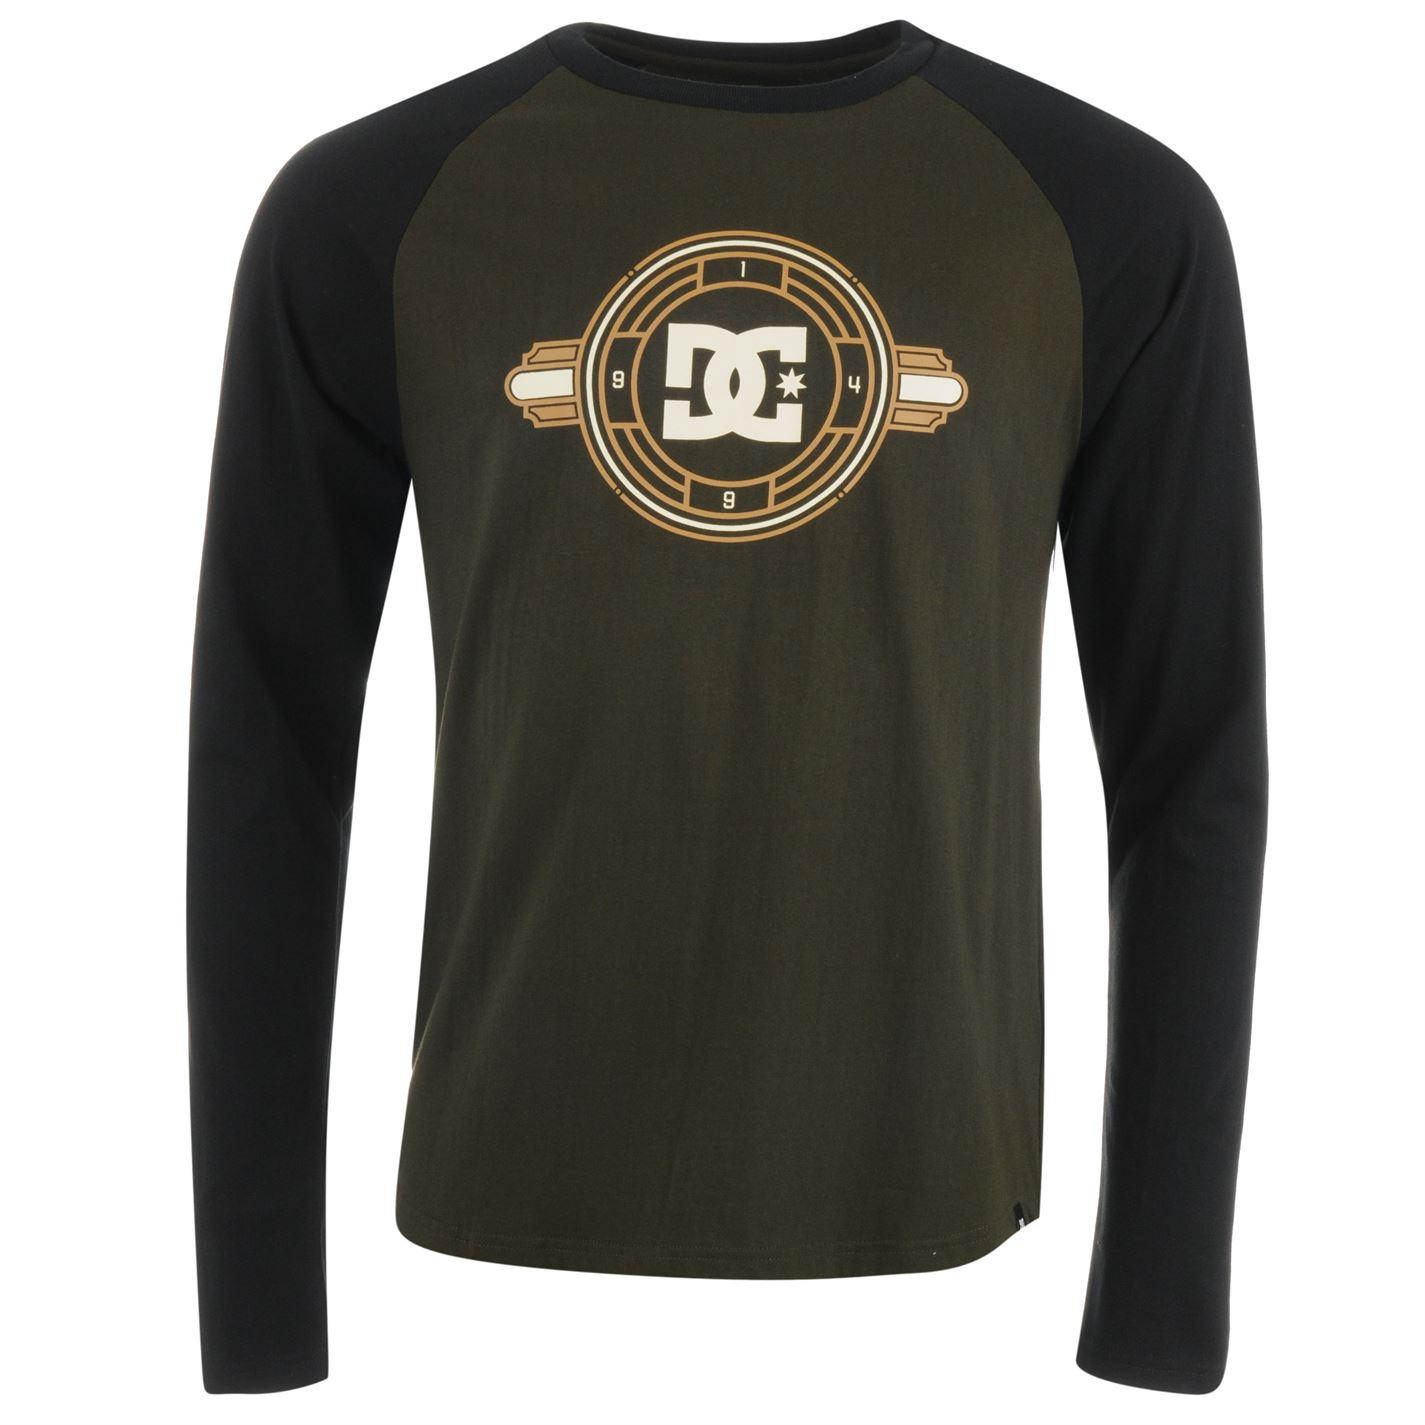 Pánske tričko DC Raglan Long Sleeve T Shirt Mens - Glami.sk 9bbafff846